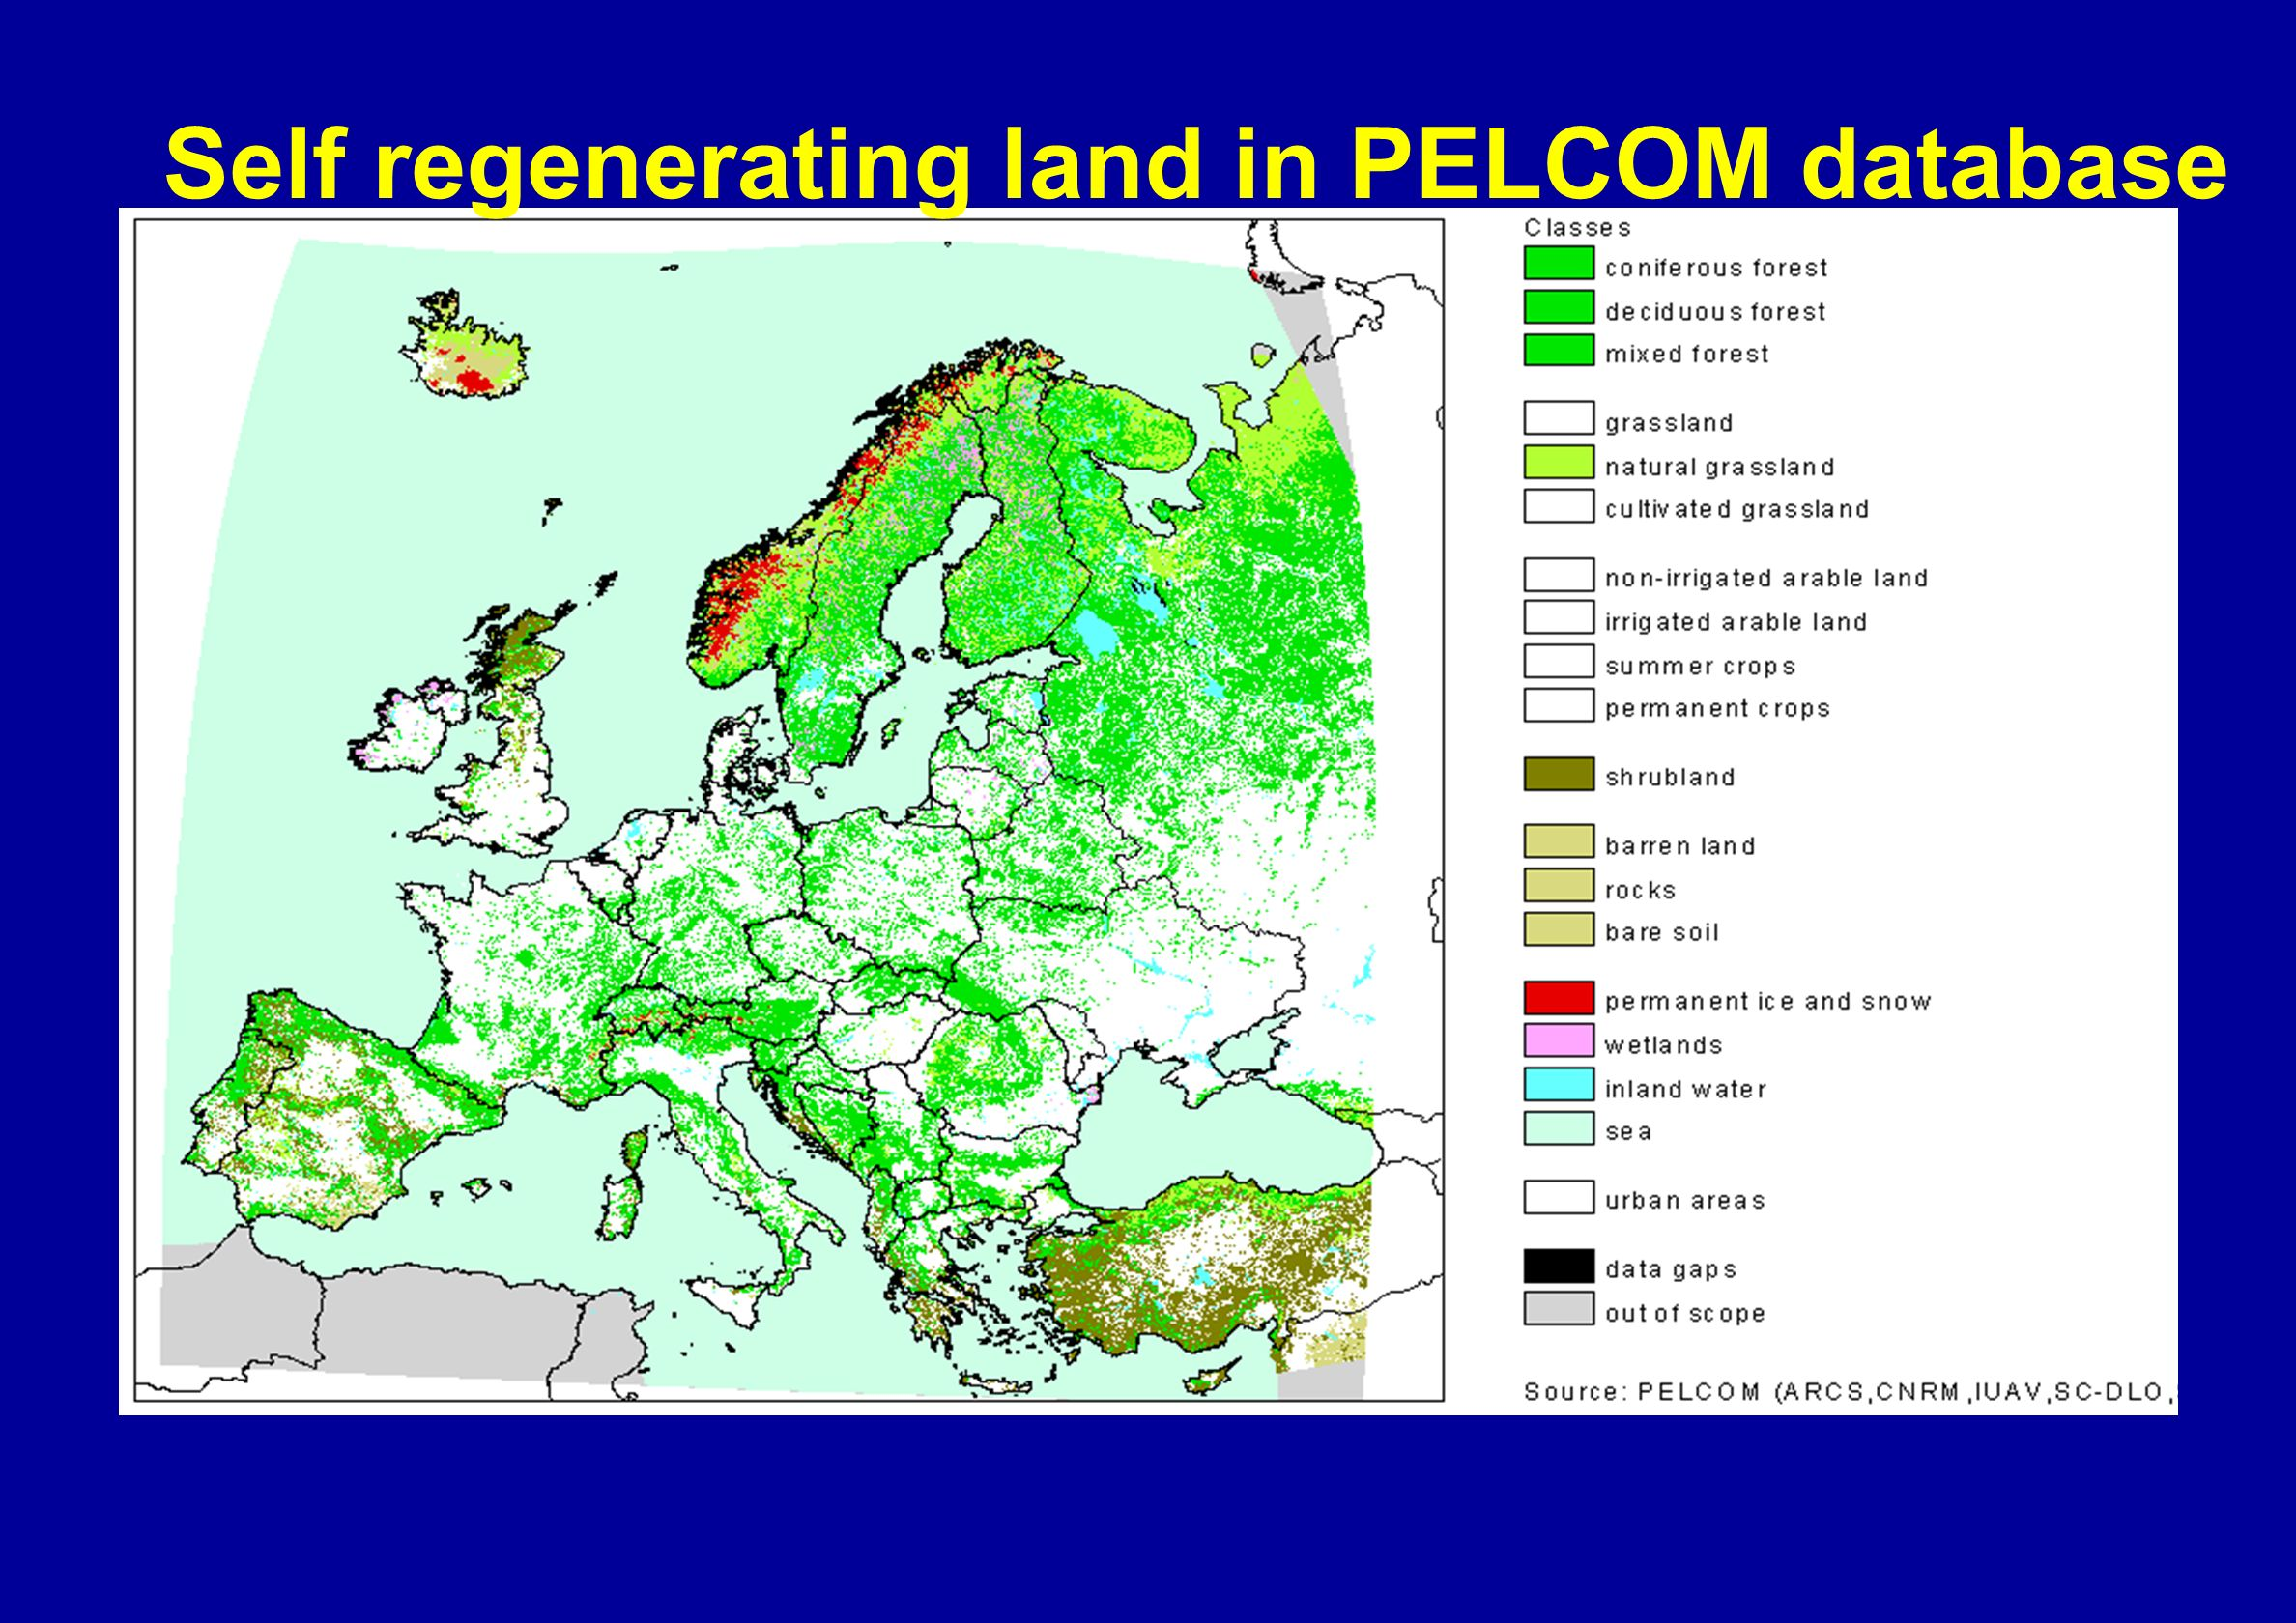 Self regenerating land in PELCOM database